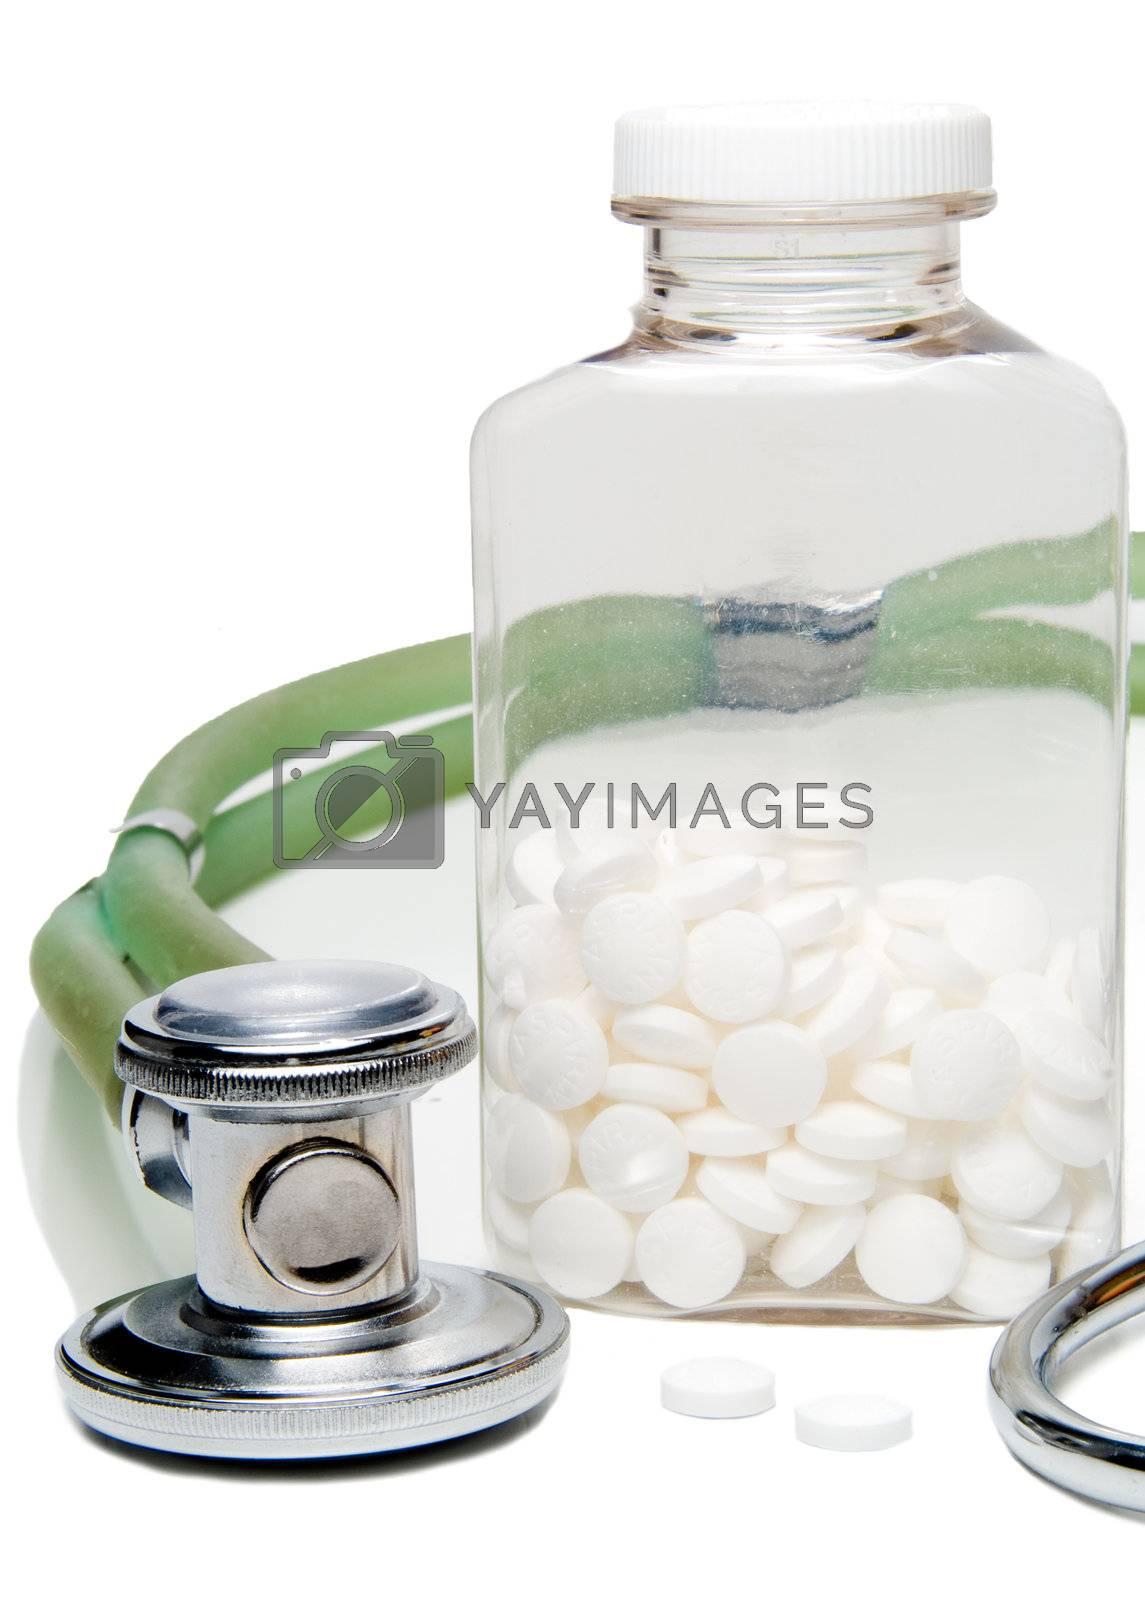 The wonder drug aspirin and a stethoscope.